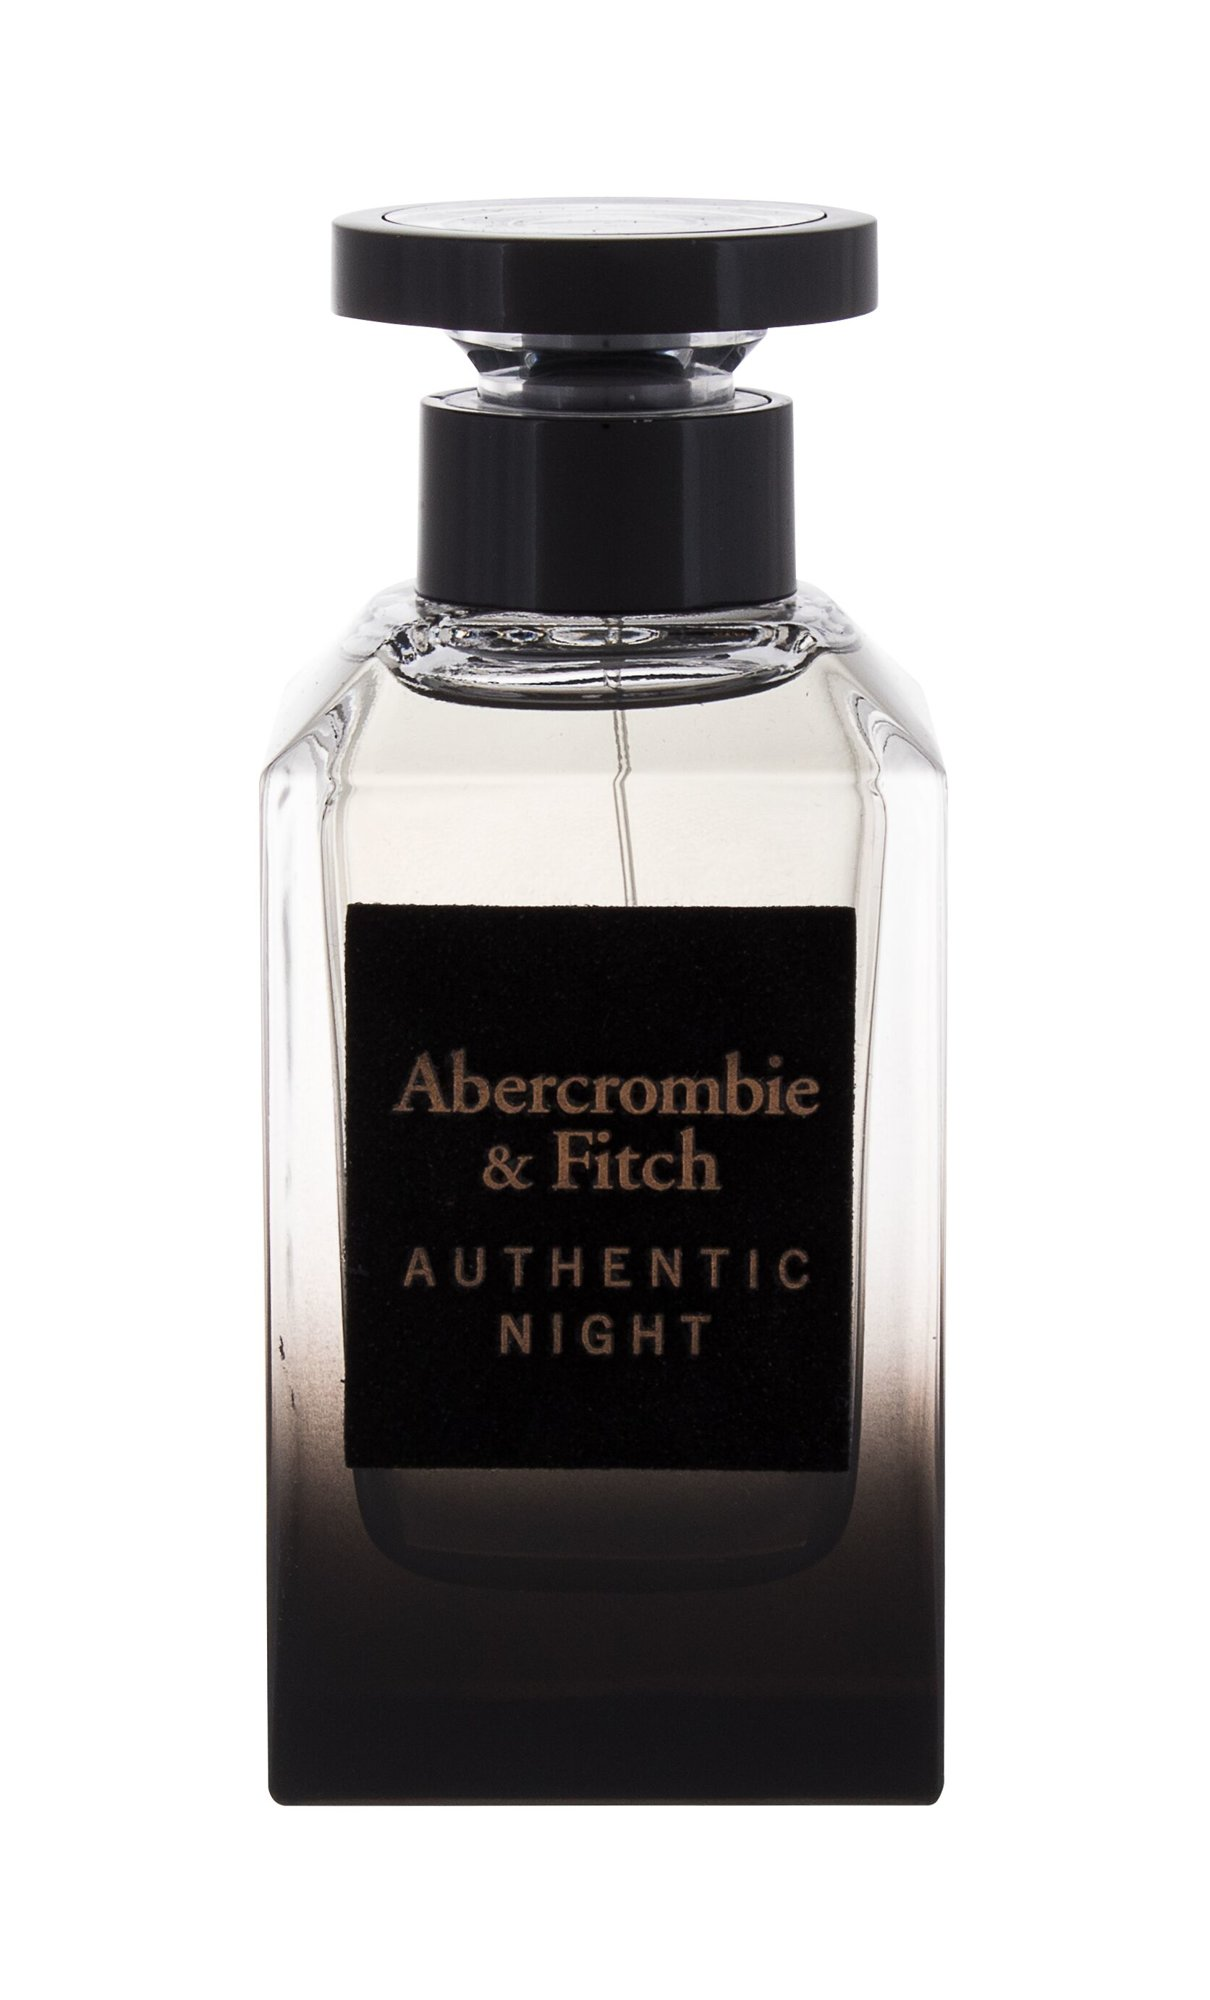 Abercrombie & Fitch Authentic Night, Toaletná voda 100ml